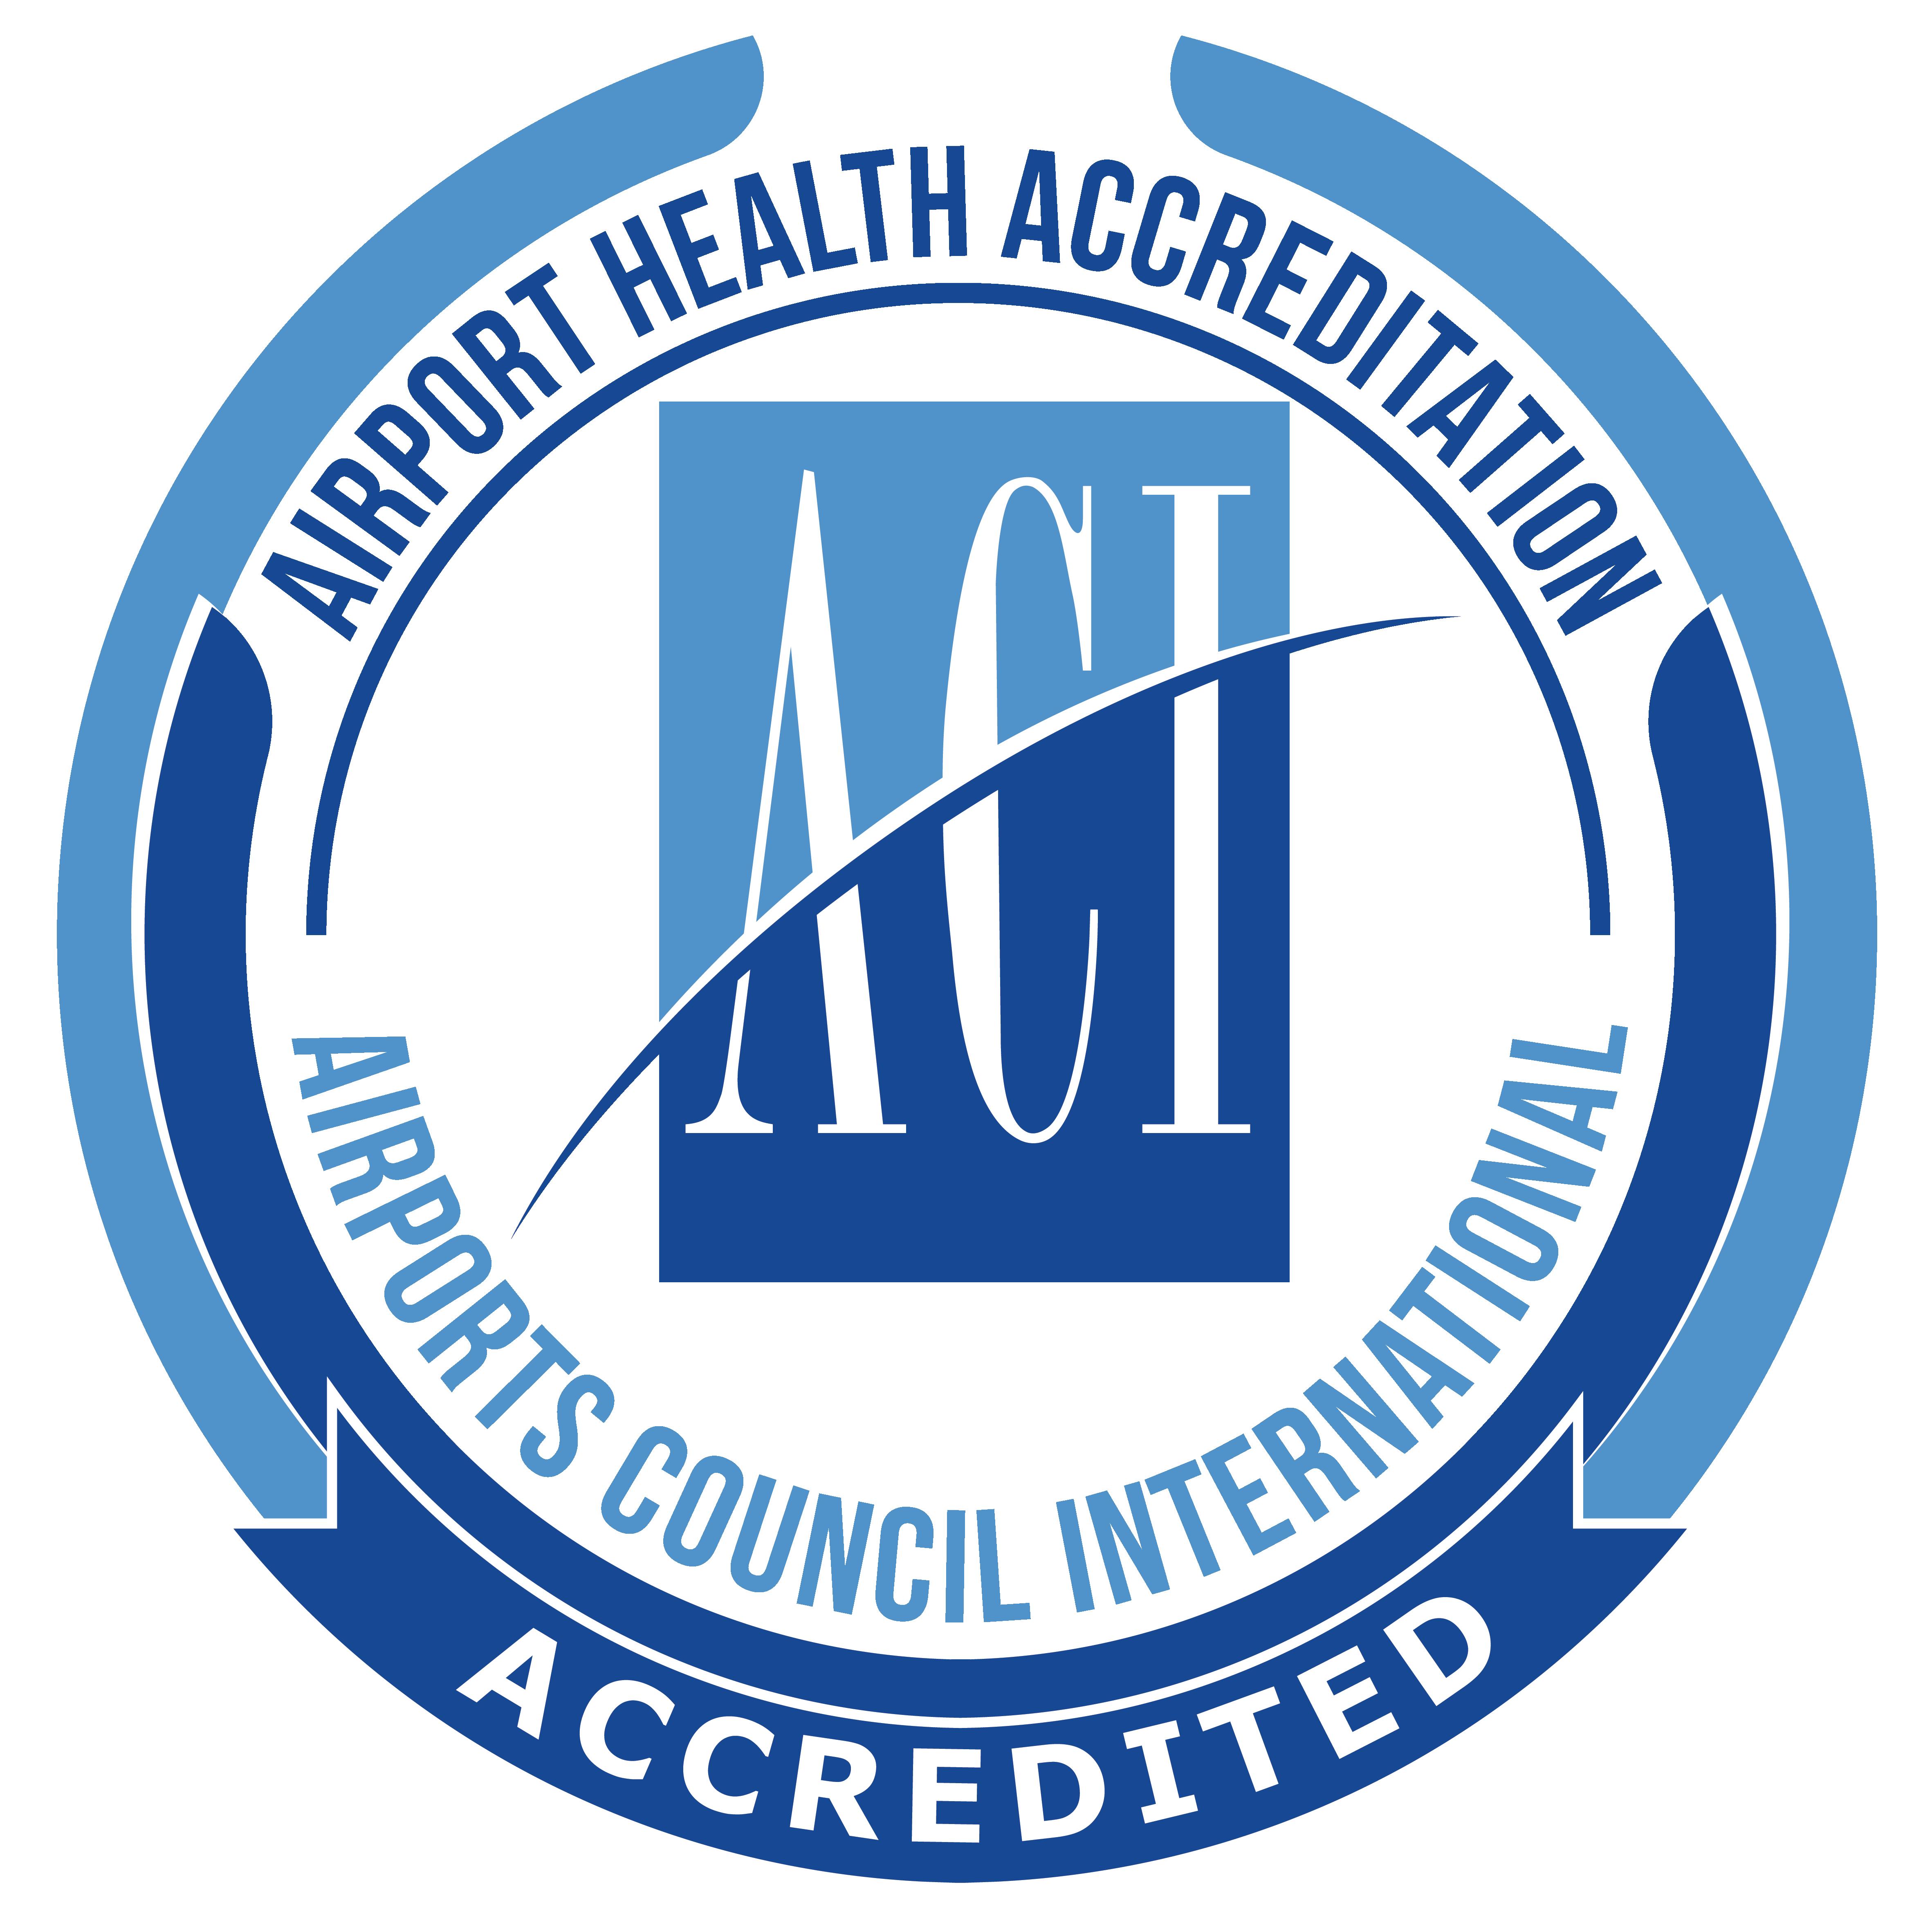 Airport Health Accreditation — Airports Council International (ACI) logo